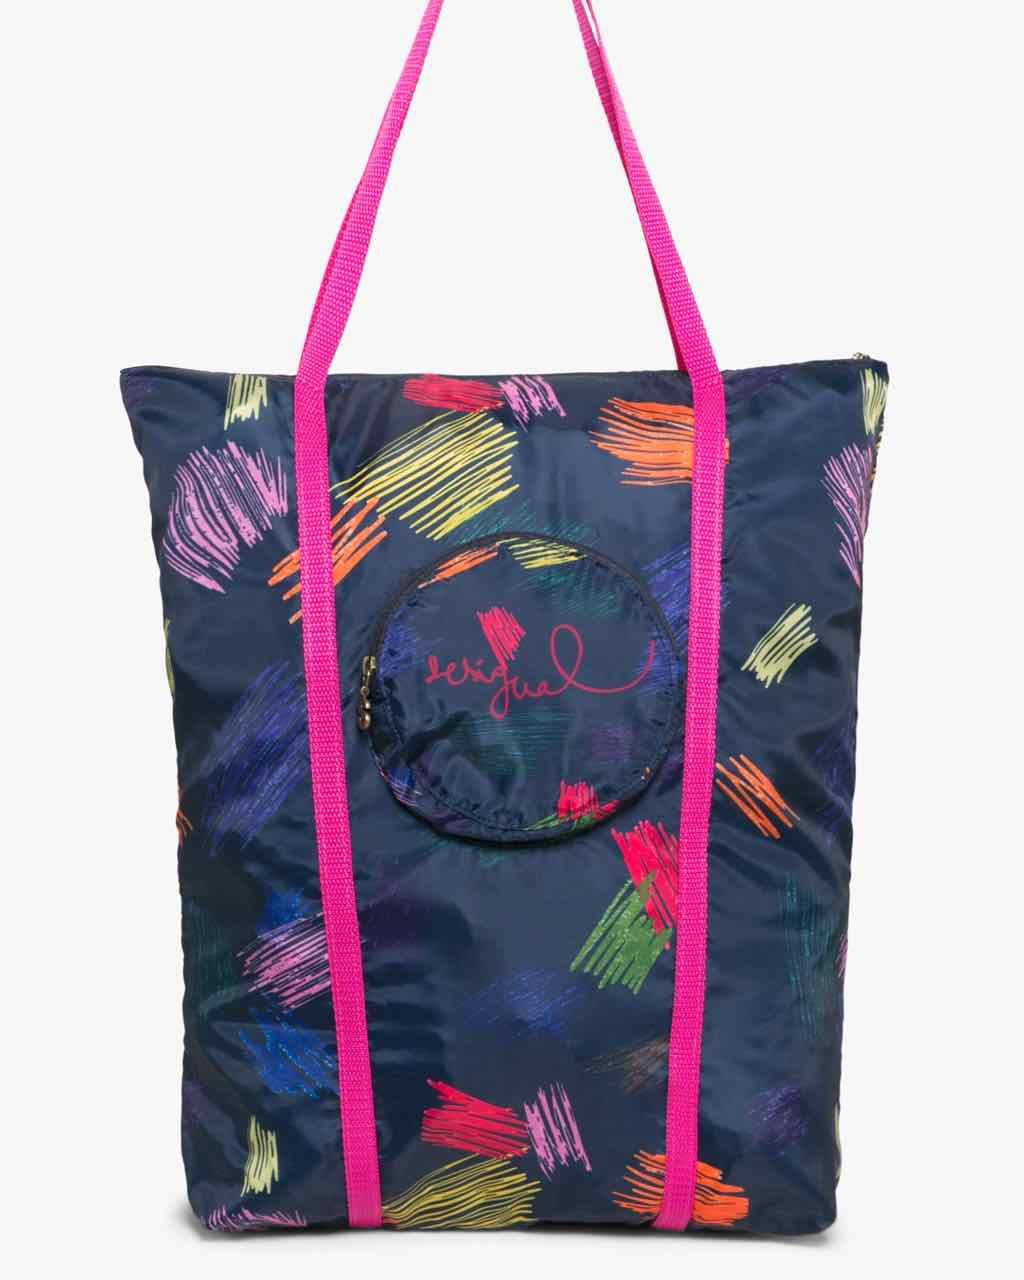 17WAXFFG_3089 Desigual Bag Shopping Ball Rayotes Buy Online